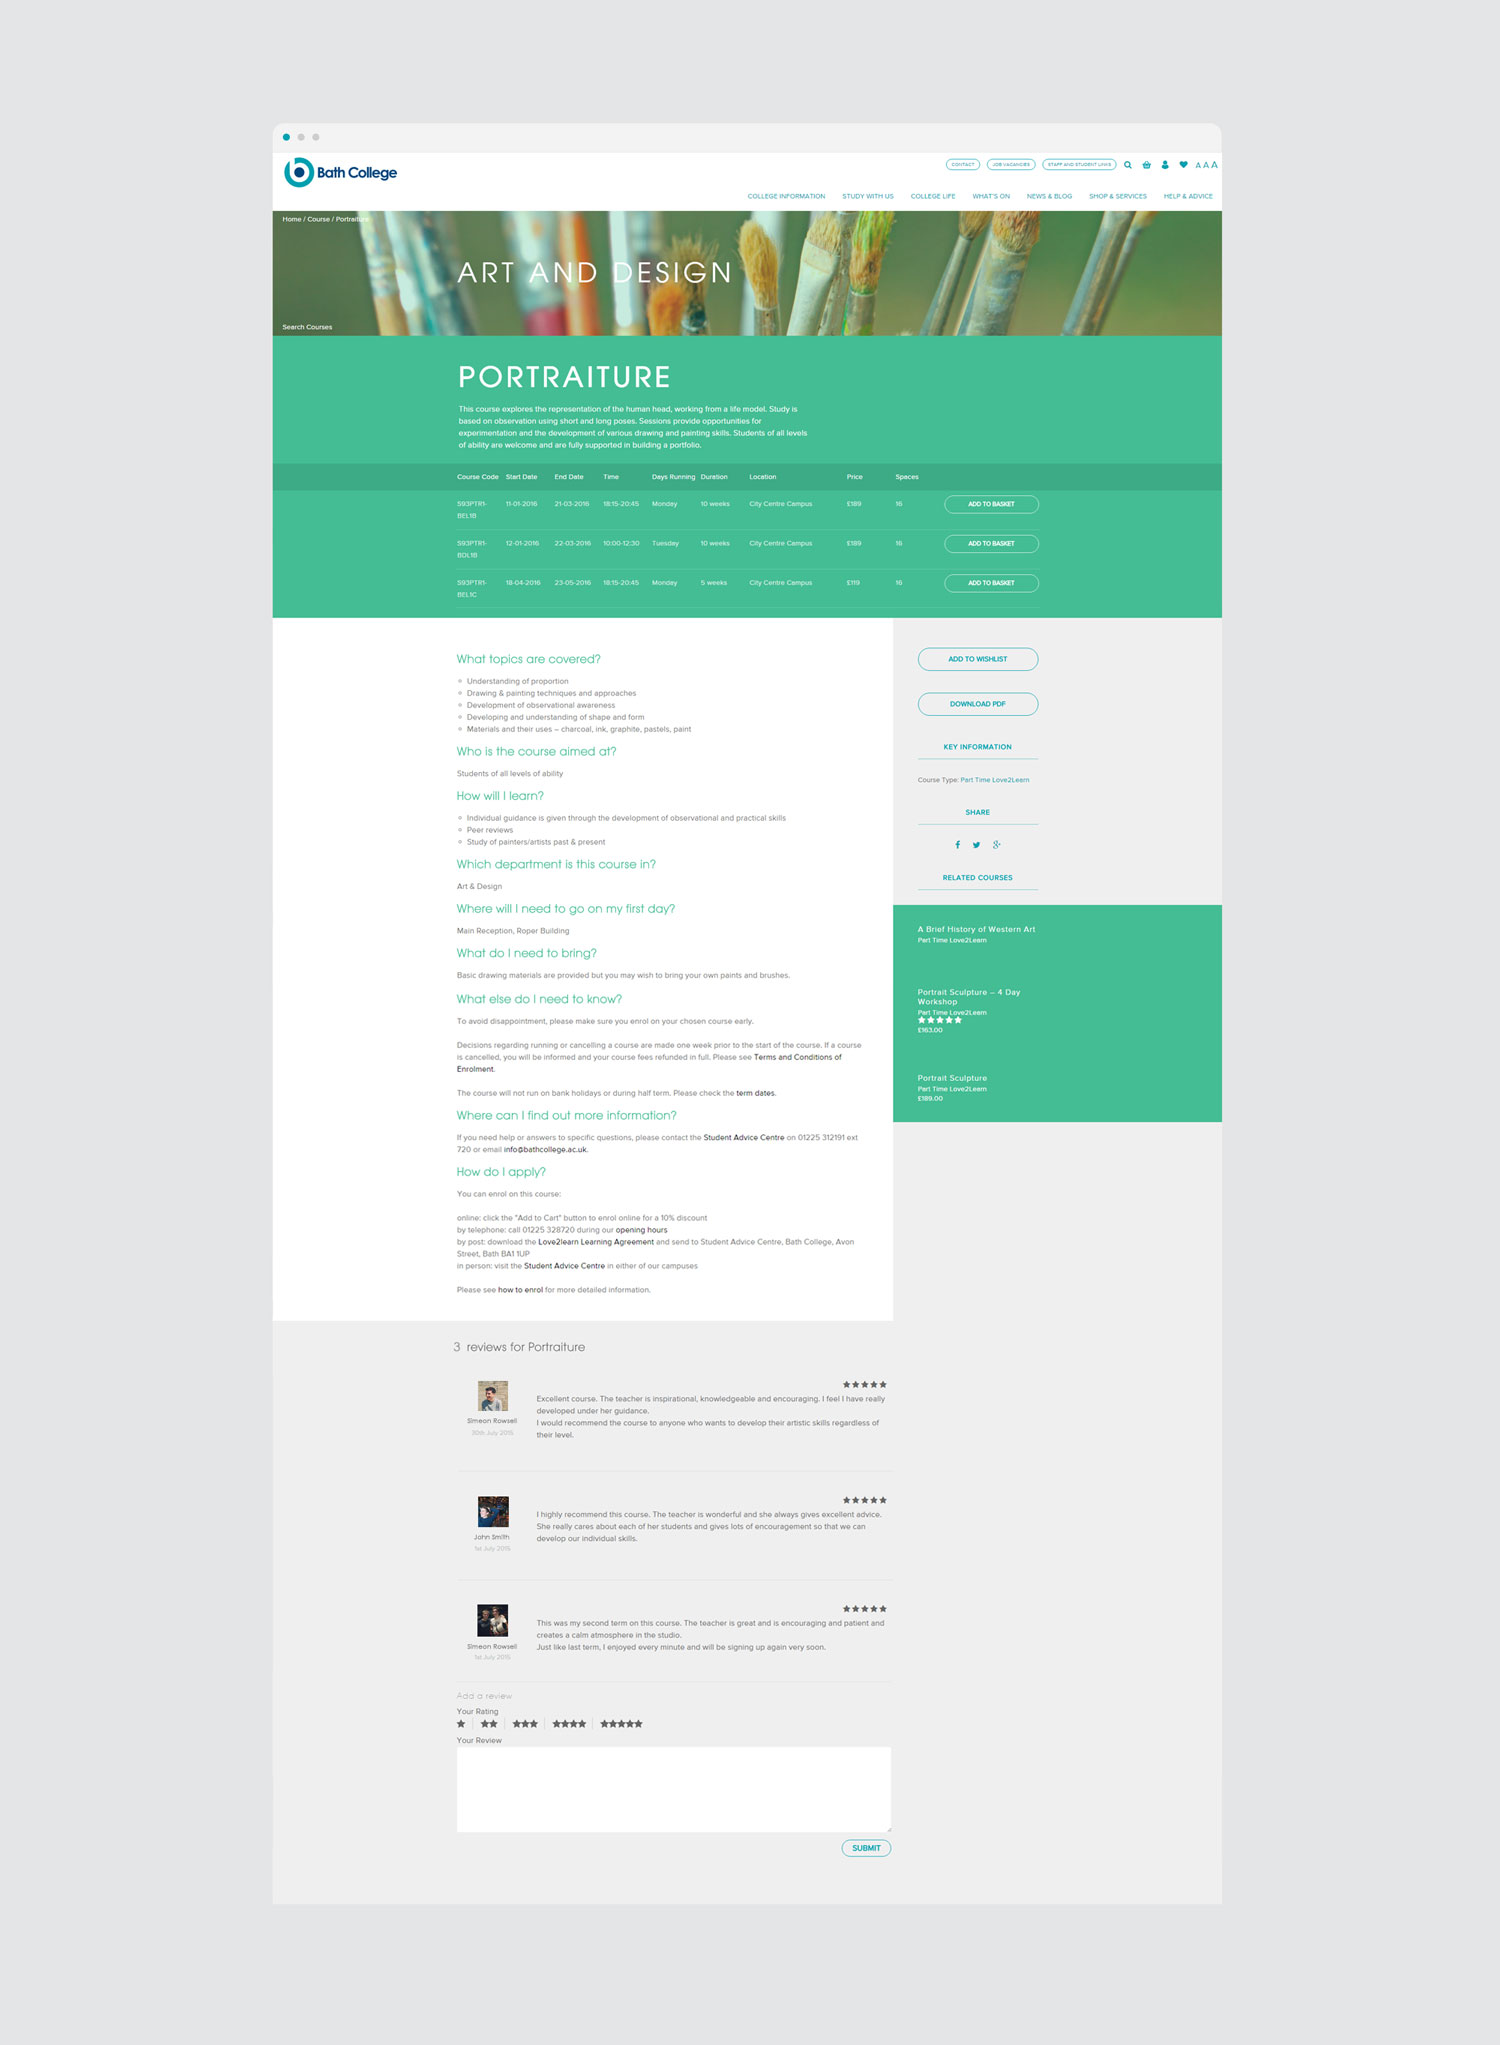 bath college course web design